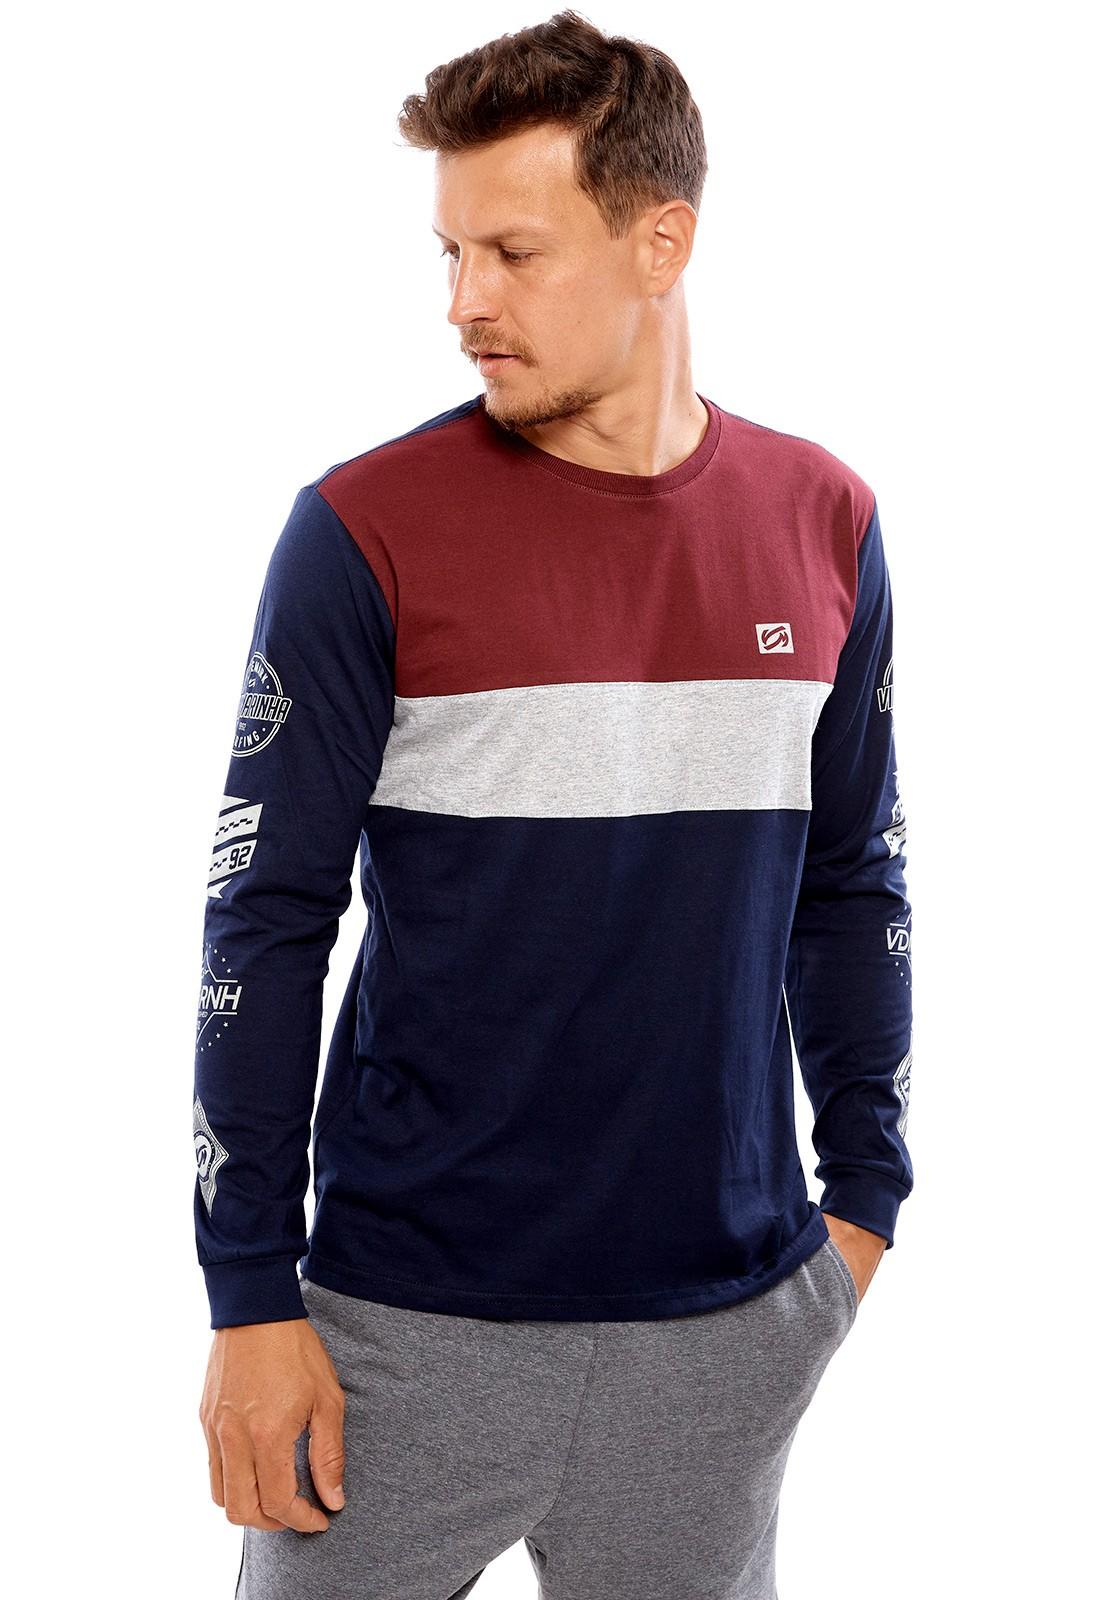 Camiseta Vida Marinha Manga Longa Bordô/Cinza/Azul